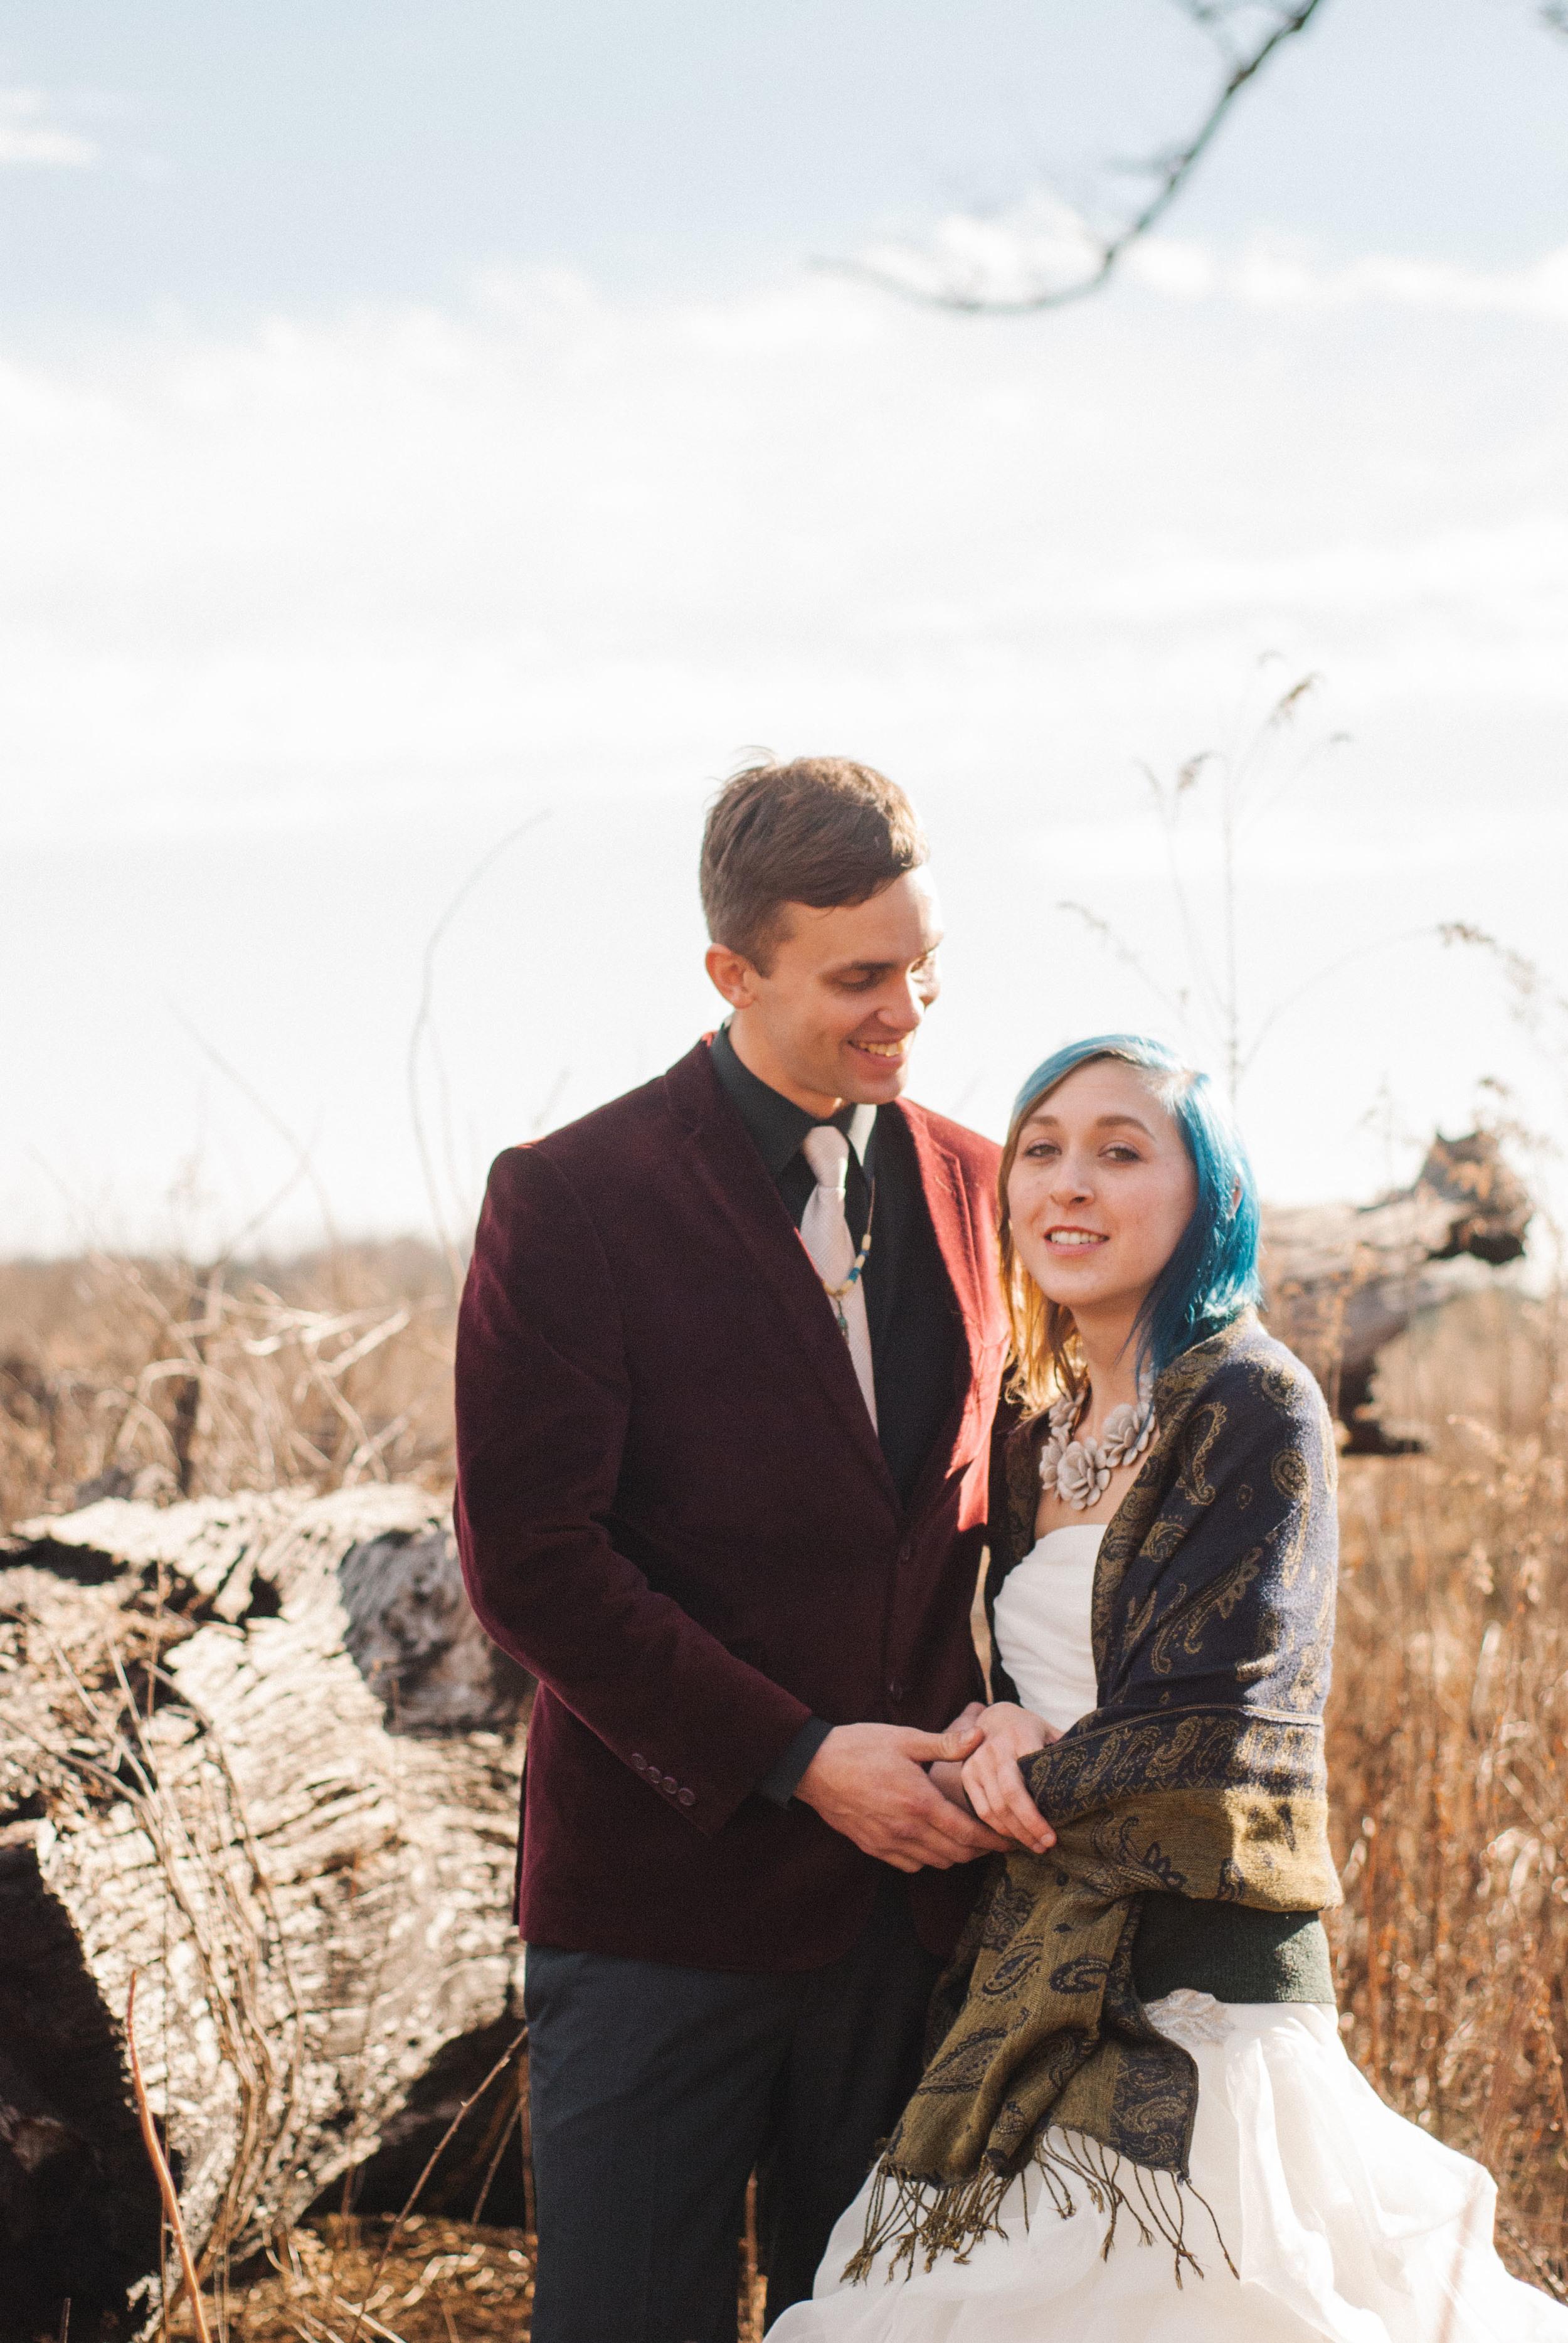 2016 Wedding - Peter + Danielle-27.jpg